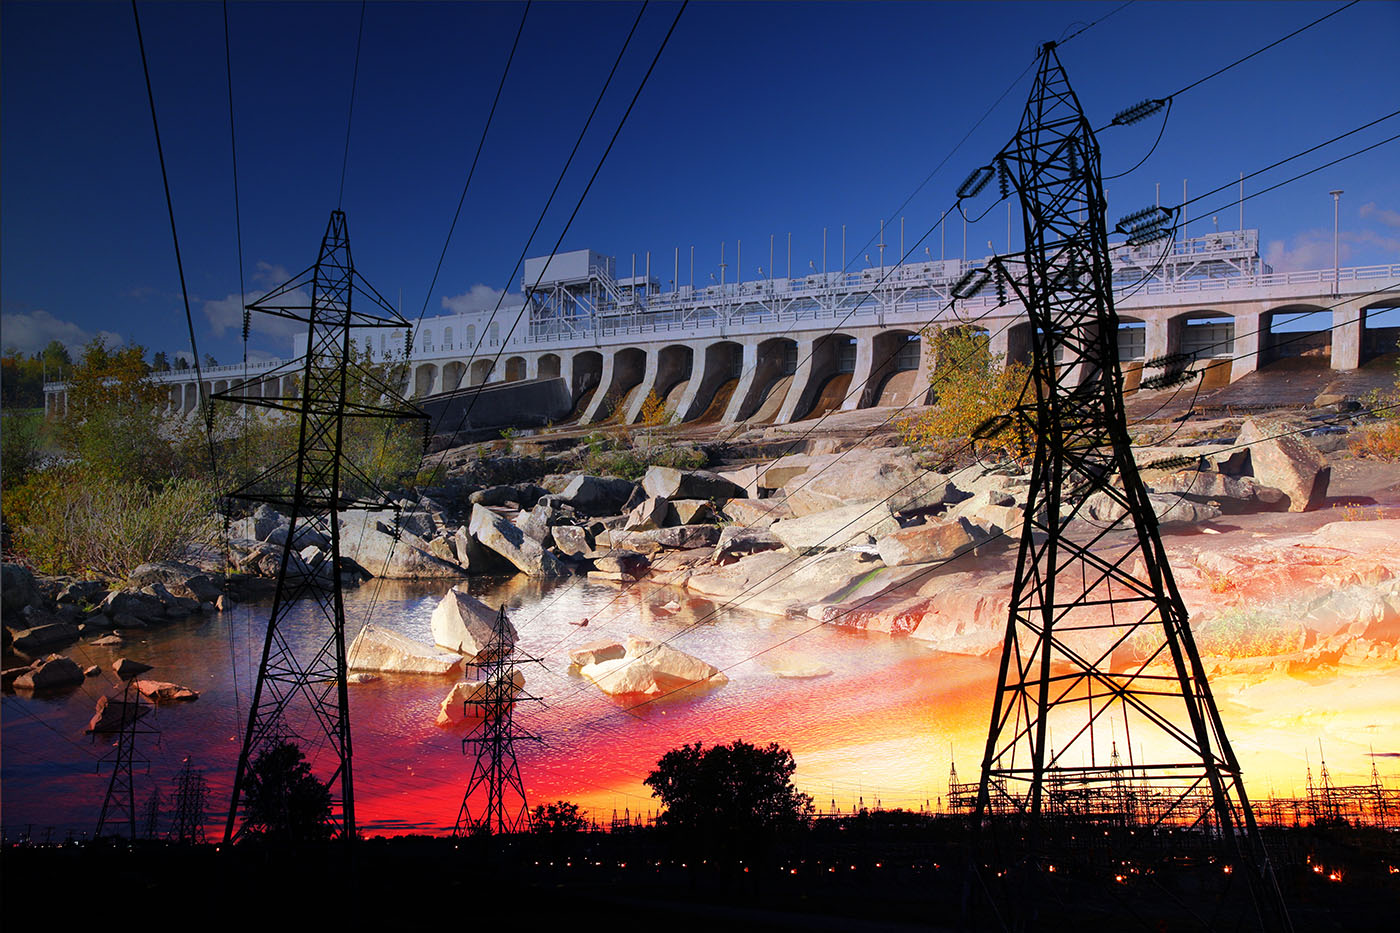 Electric Dam 03 - Stock Photo